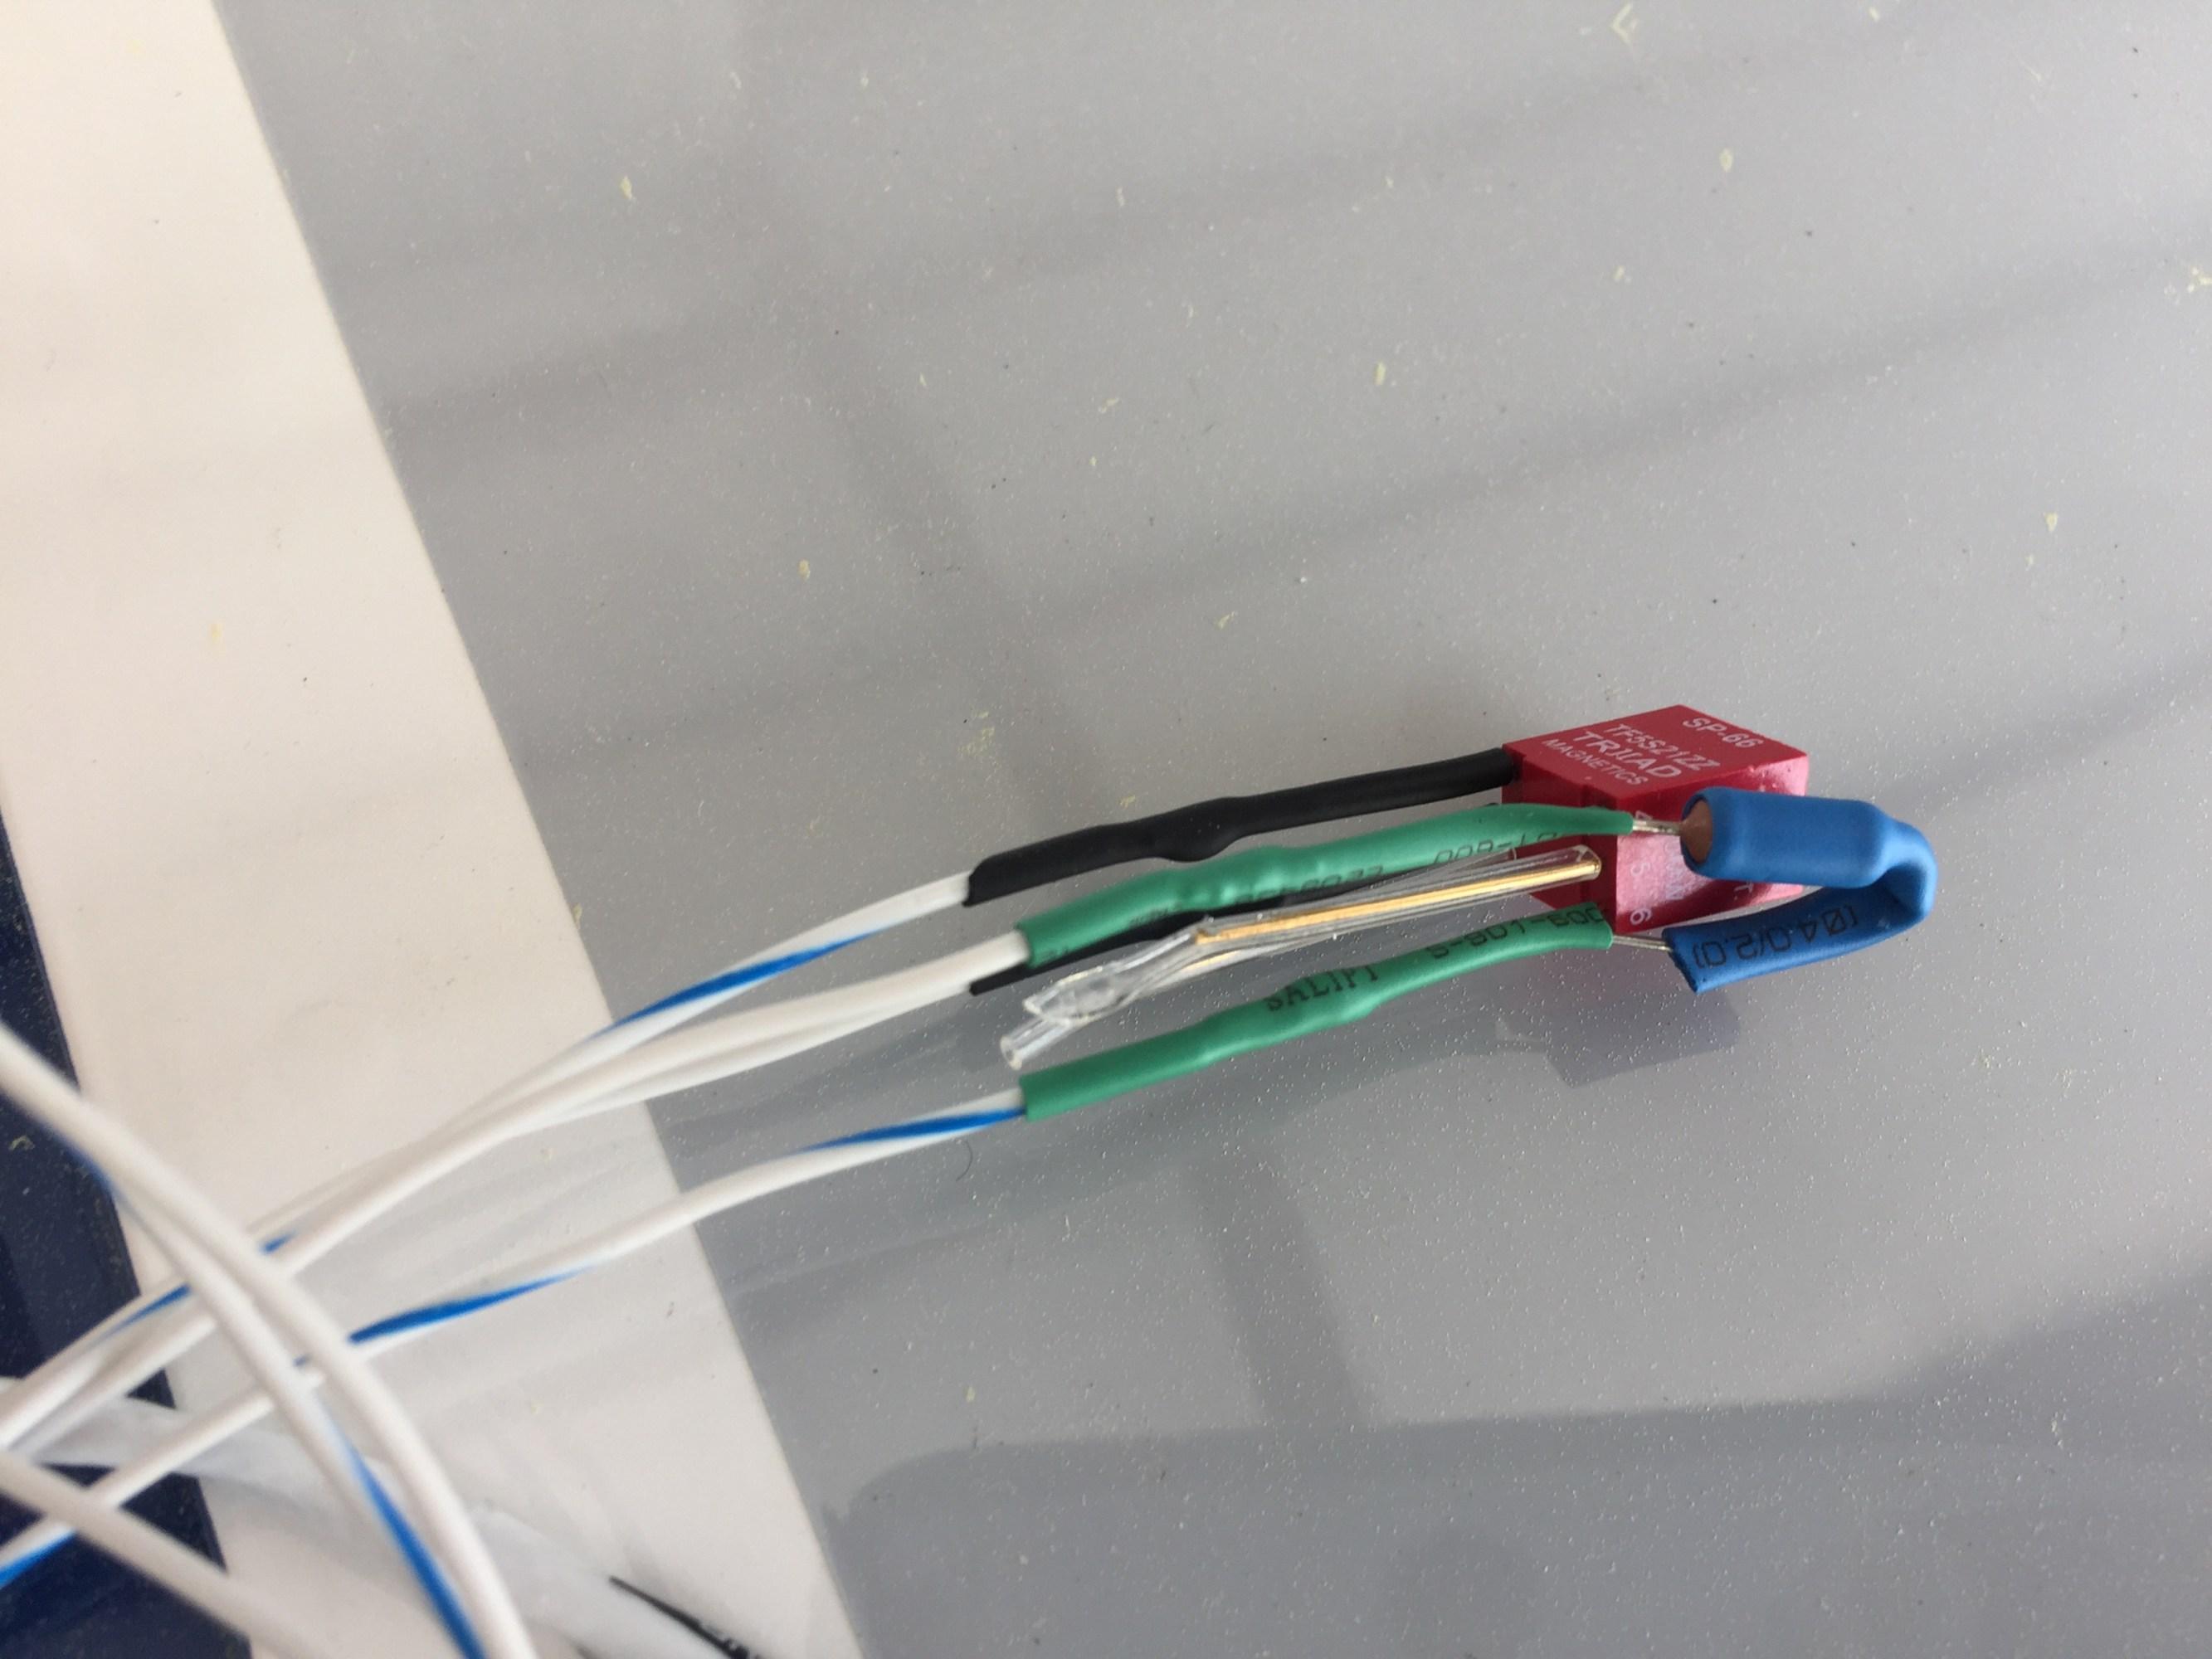 hight resolution of garmin g5 wiring harness ngs wiring diagram jensen radio wiring harness garmin wiring harness